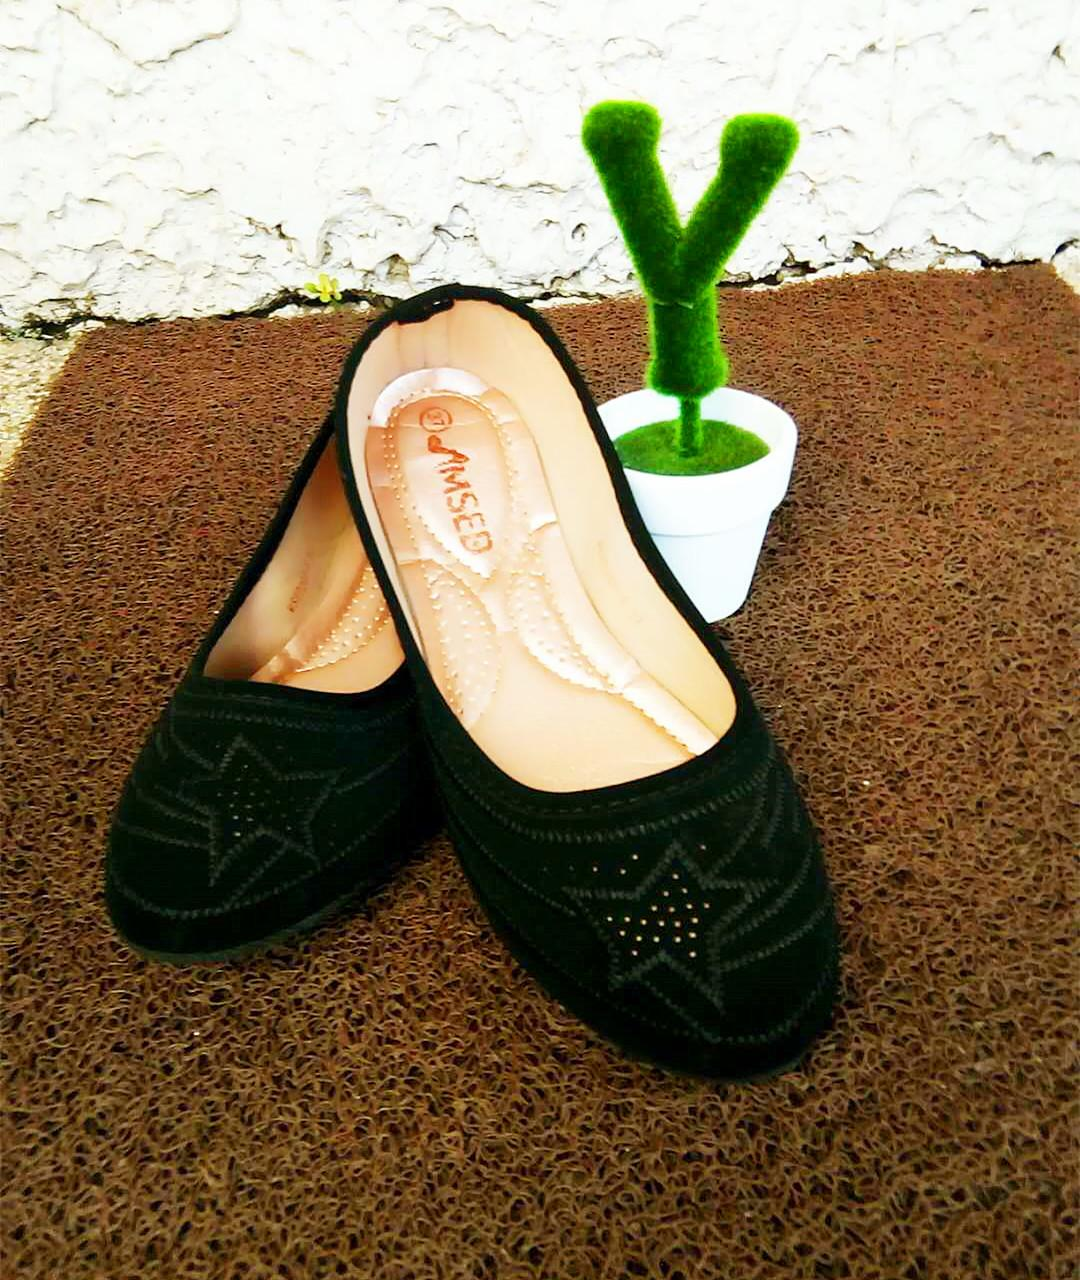 6776678f8 Flat Sandals for Women for sale - Summer Sandals online brands ...